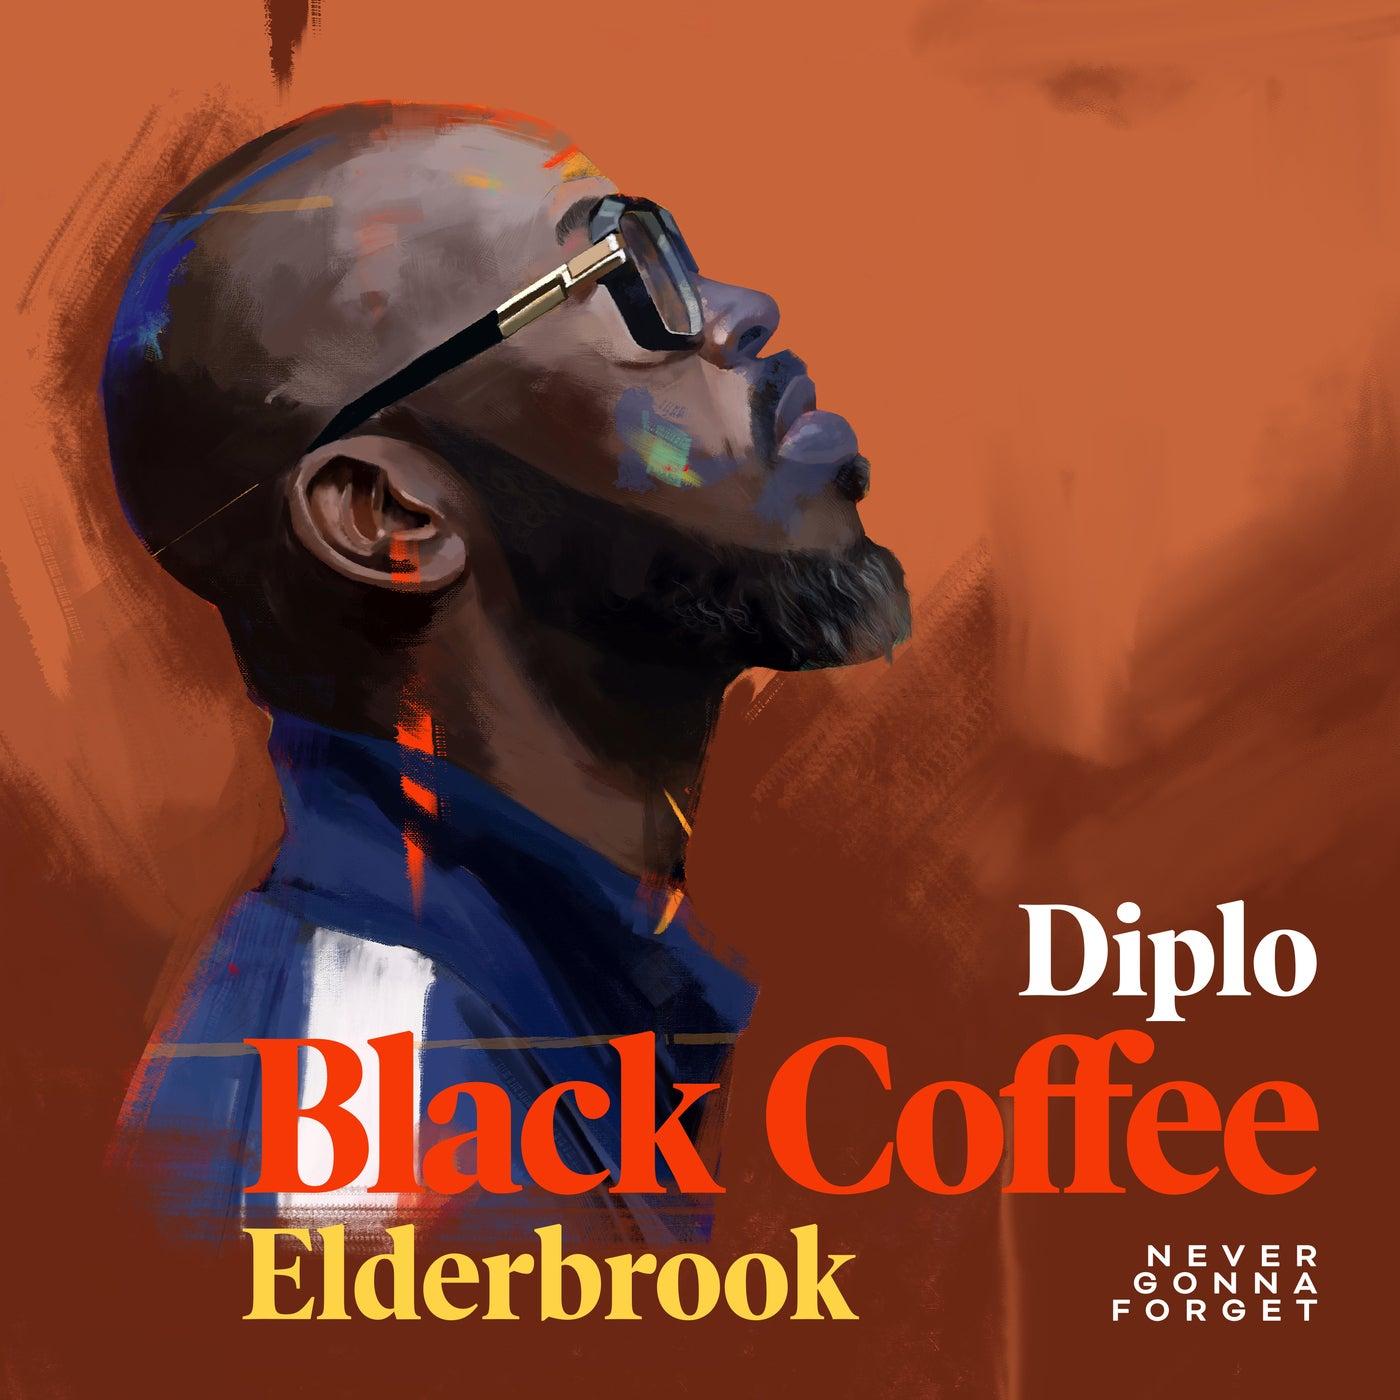 Never Gonna Forget feat. Elderbrook